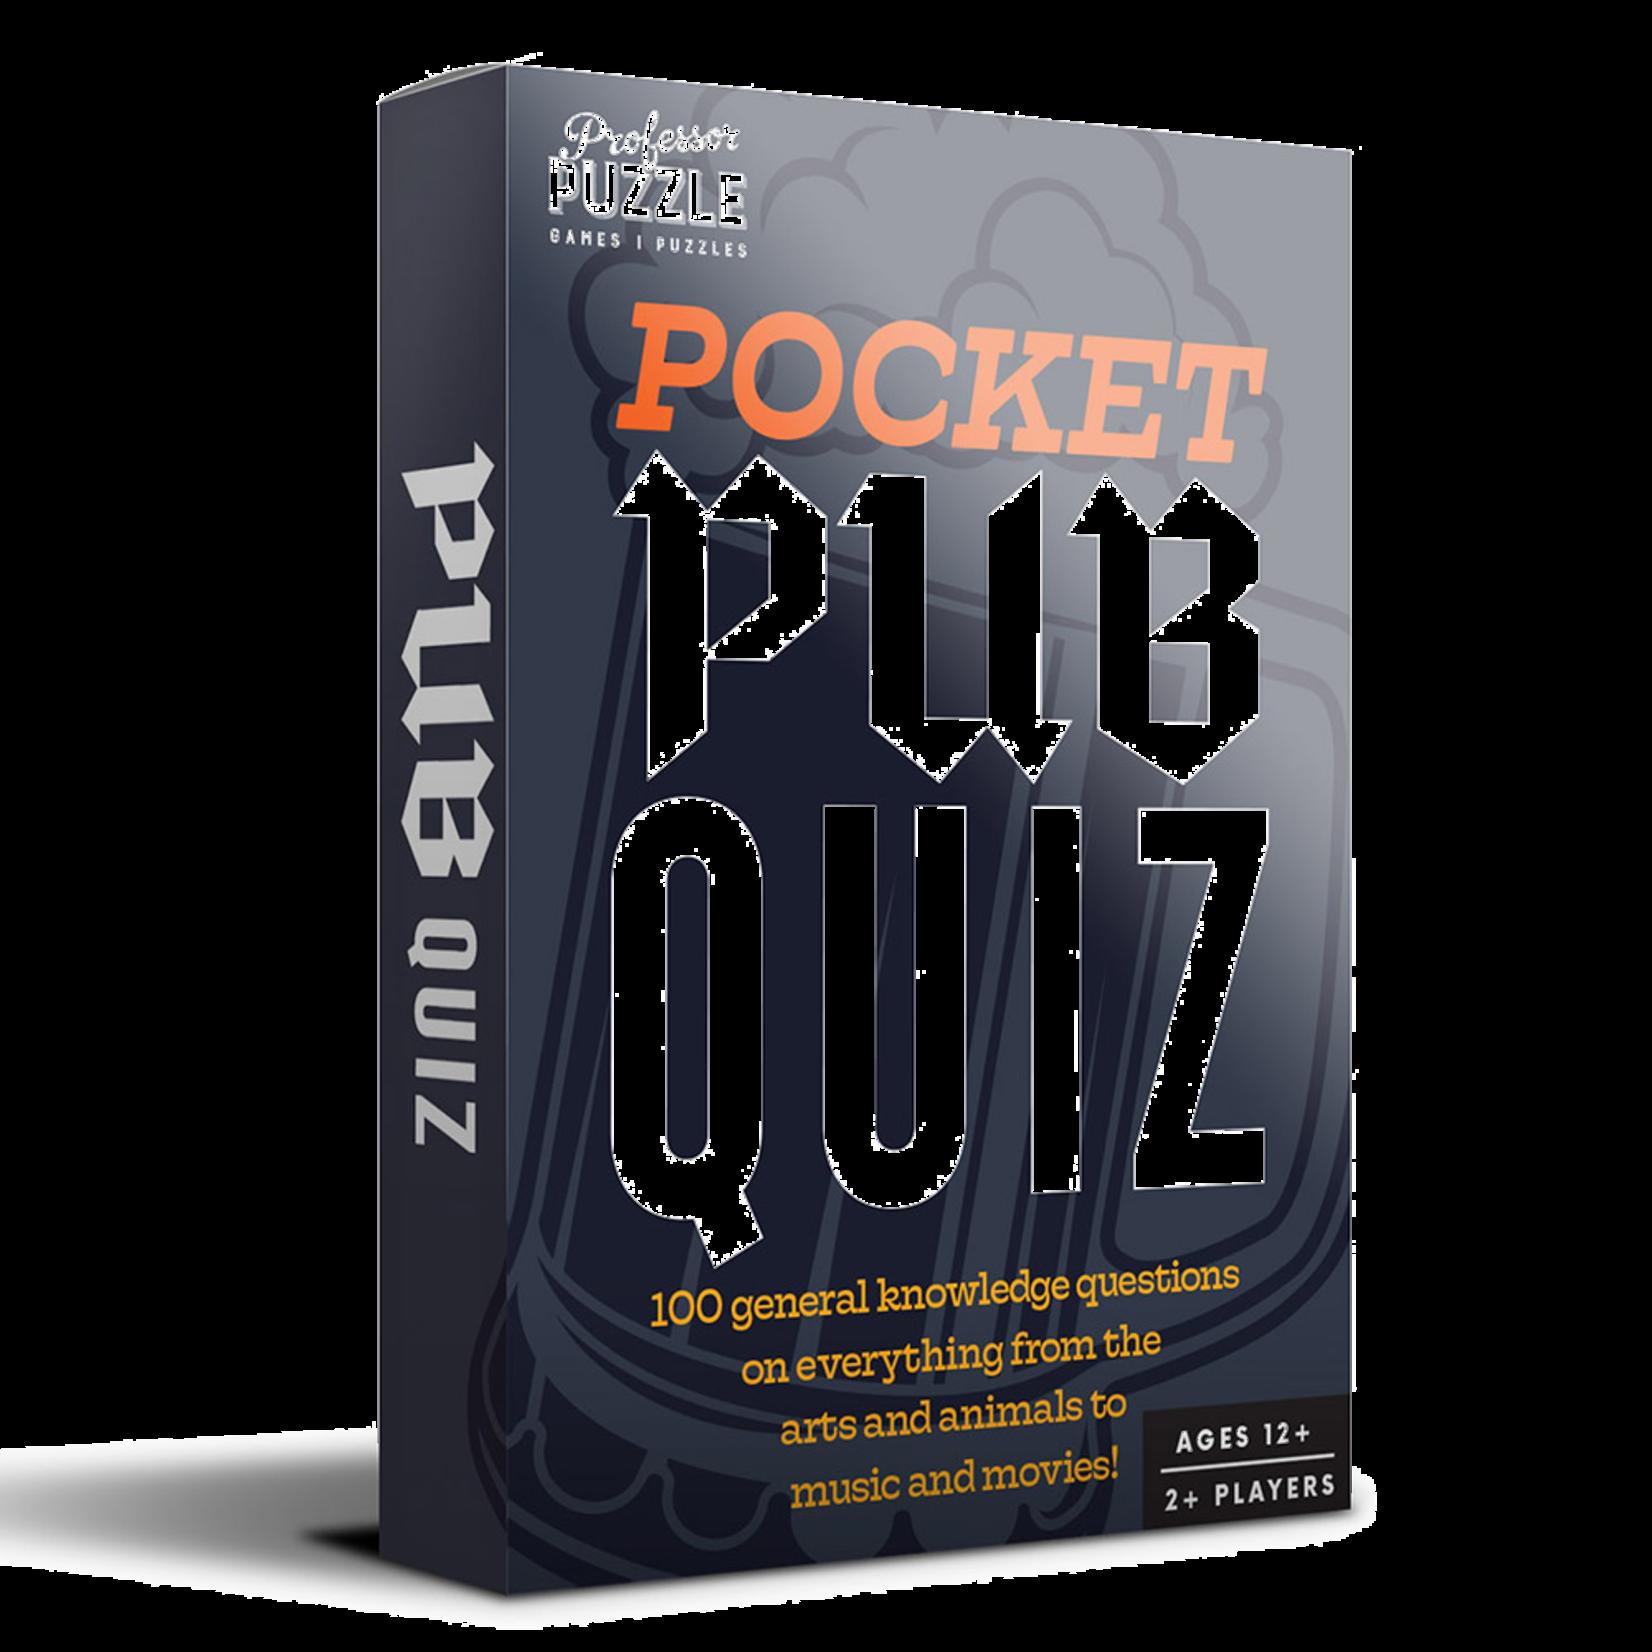 Professor Puzzle Pocket Pub Quiz